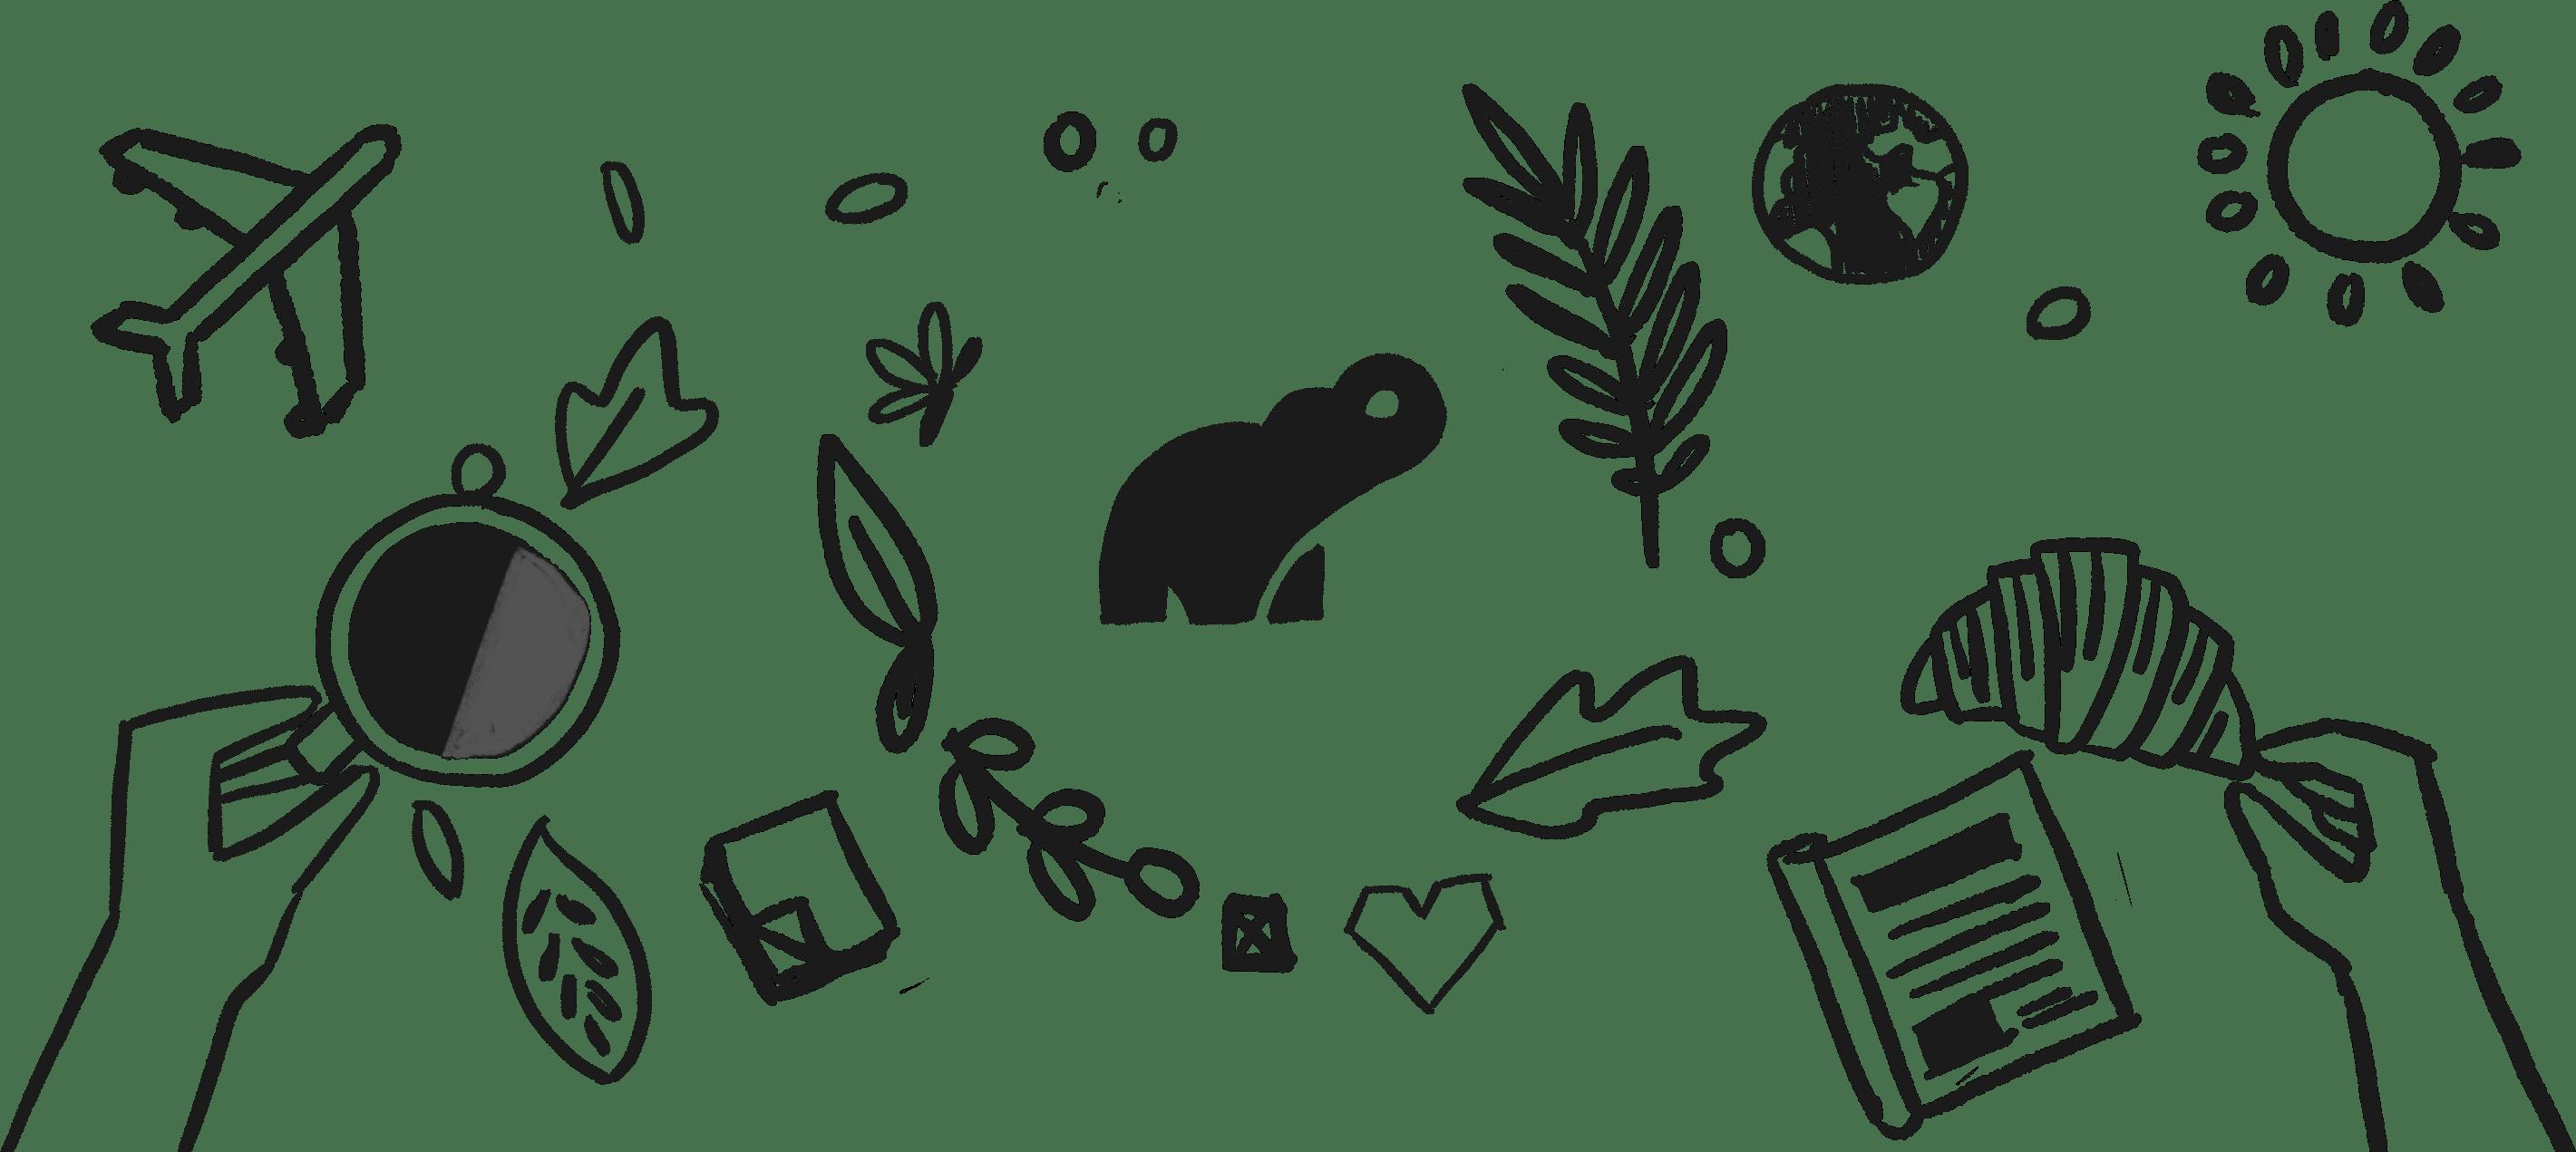 concept for elefint